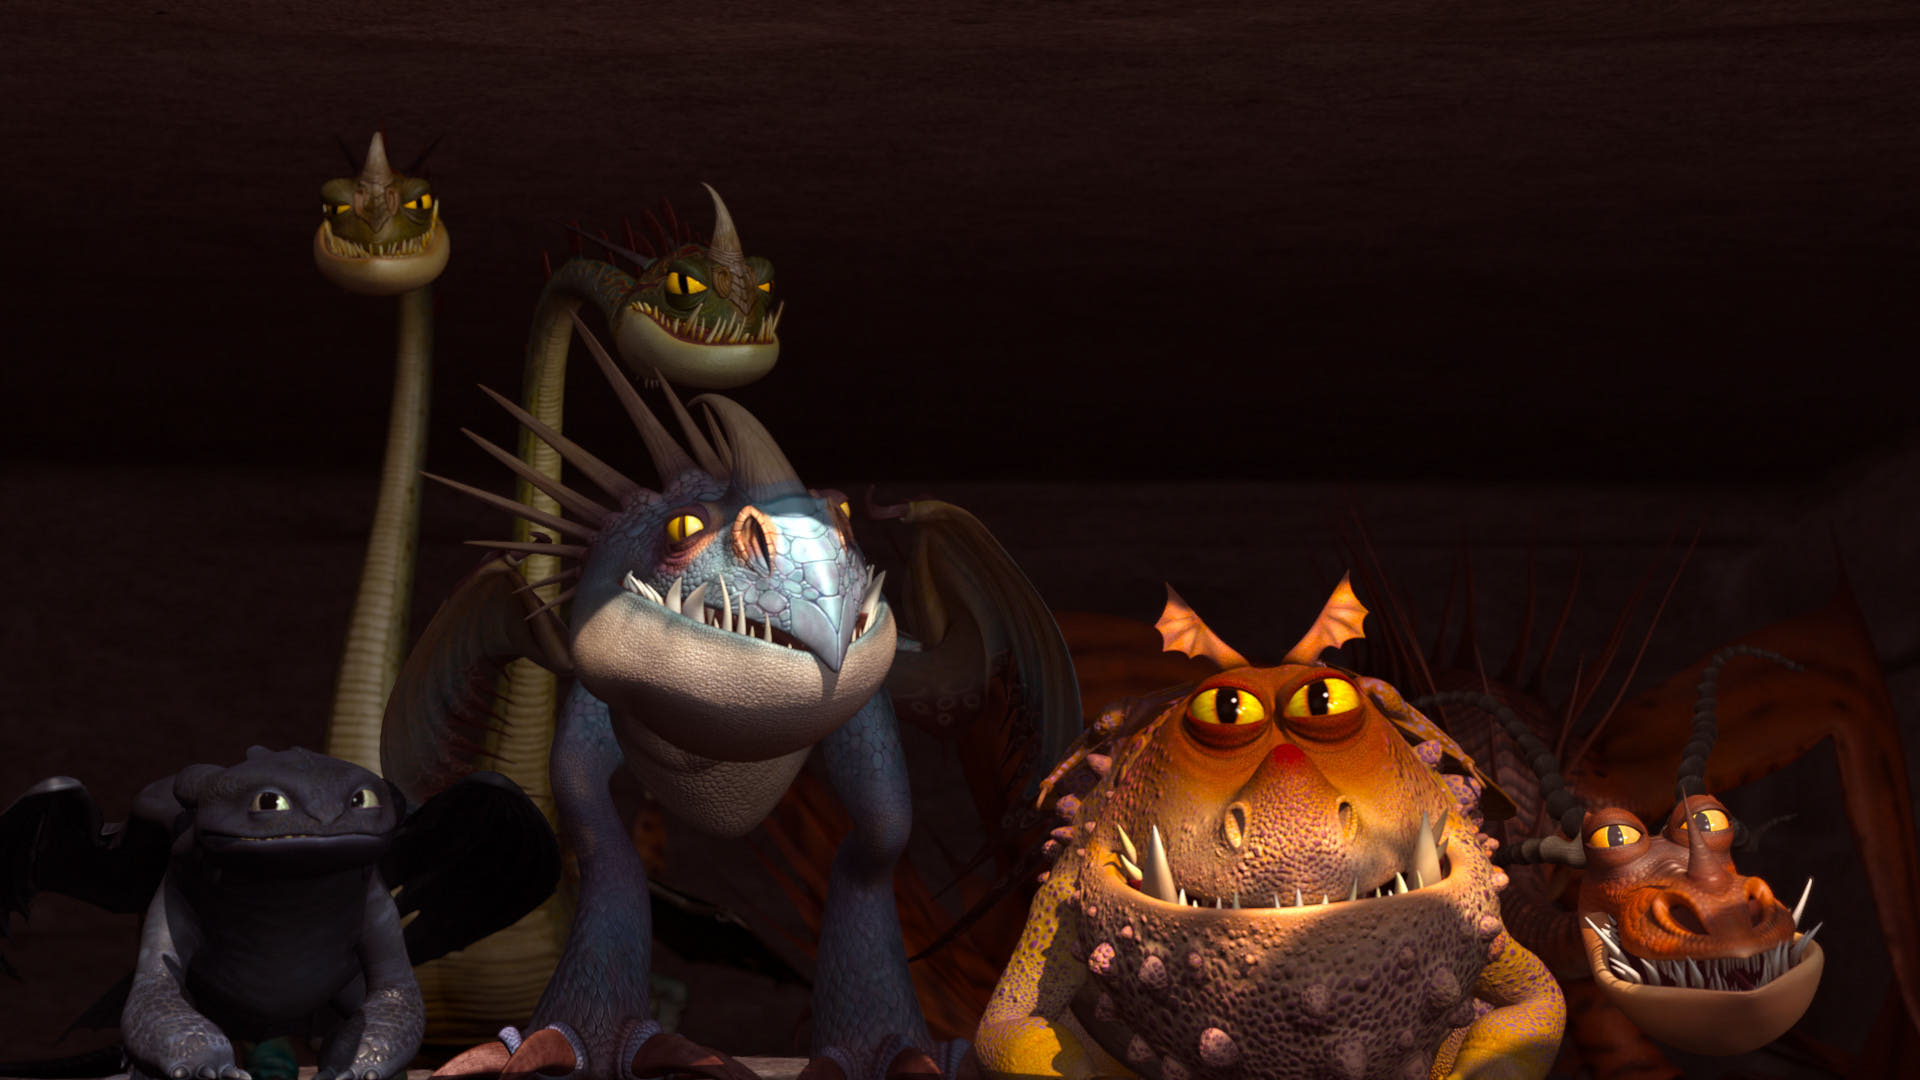 how to train your dragon tv series season 4